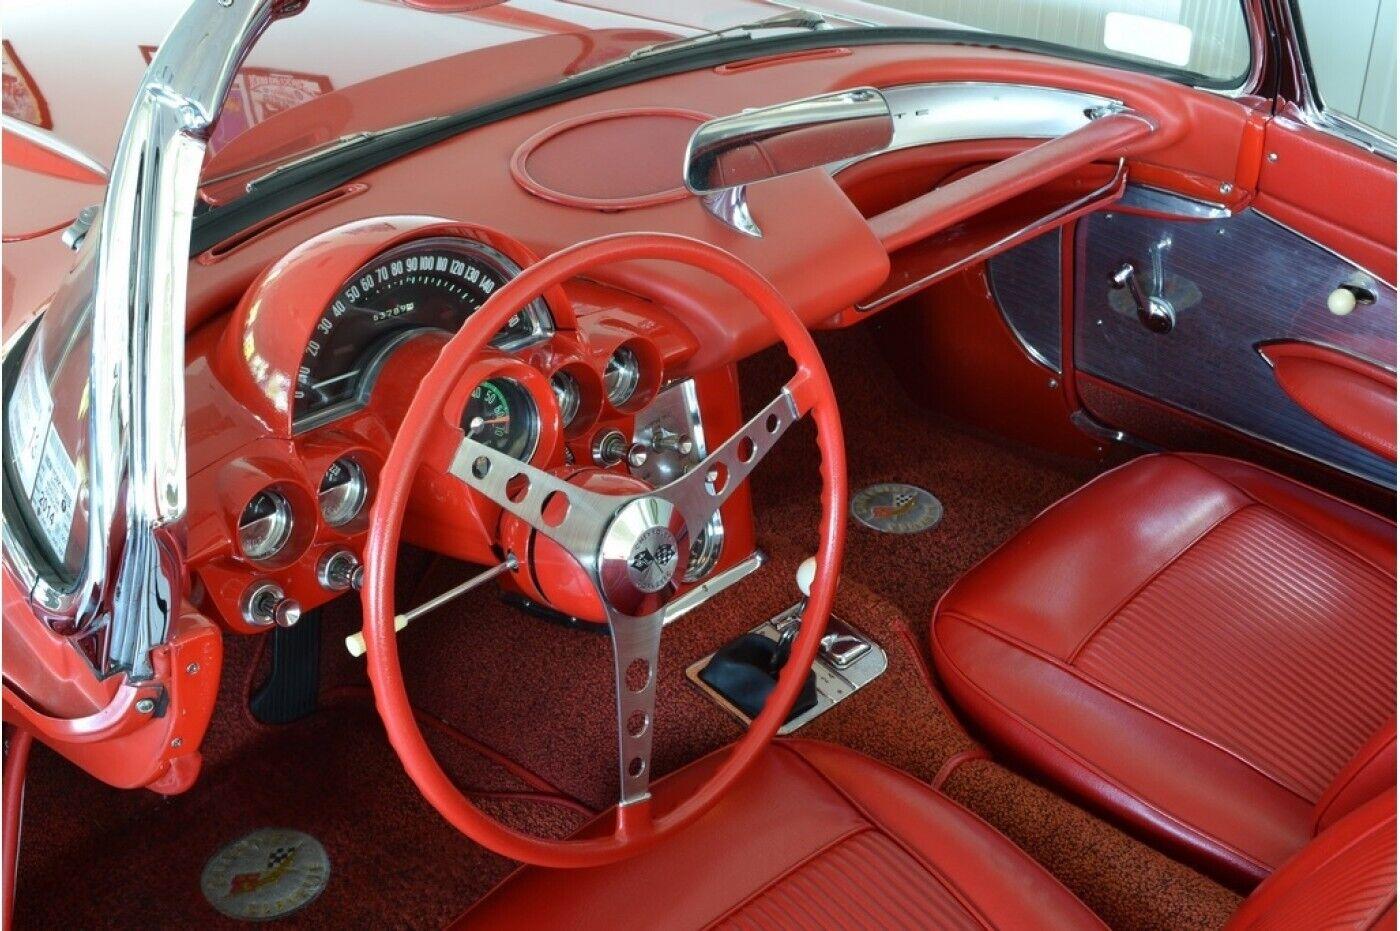 1961 Red Chevrolet Corvette   | C1 Corvette Photo 6